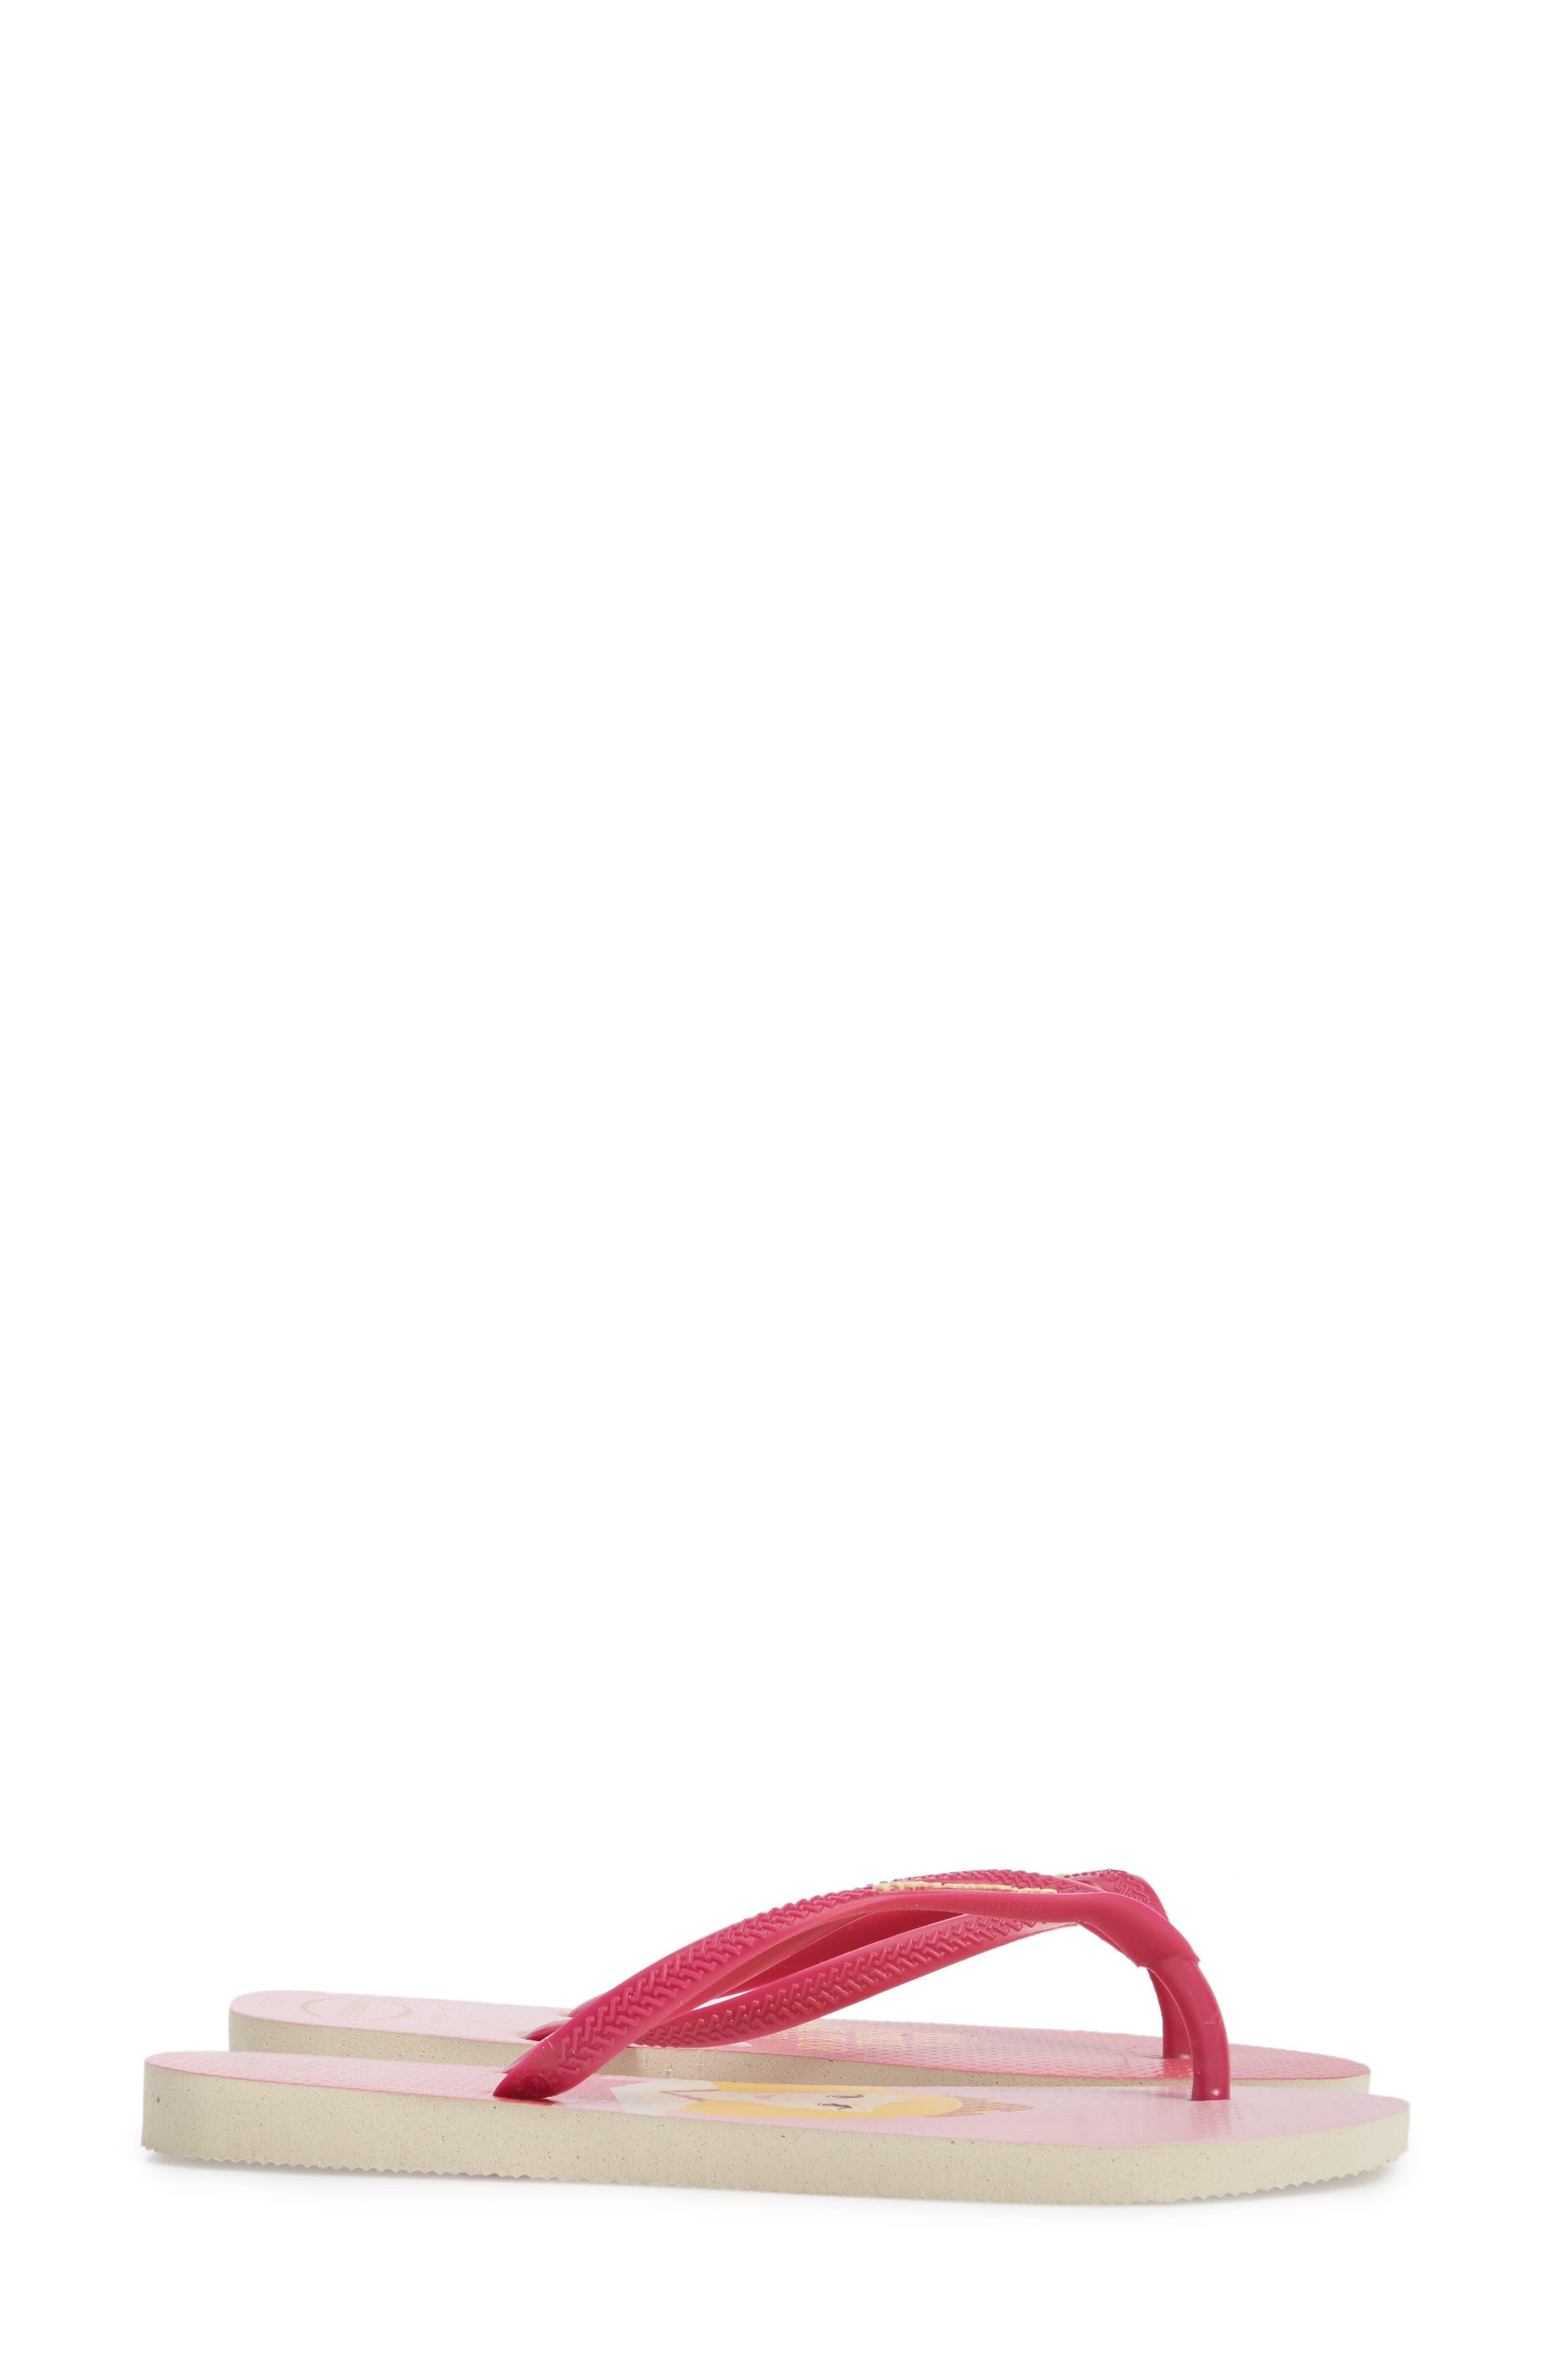 Havaiana Slim - Disney Princess Flip Flop,                             Alternate thumbnail 3, color,                             Beige/ Pink